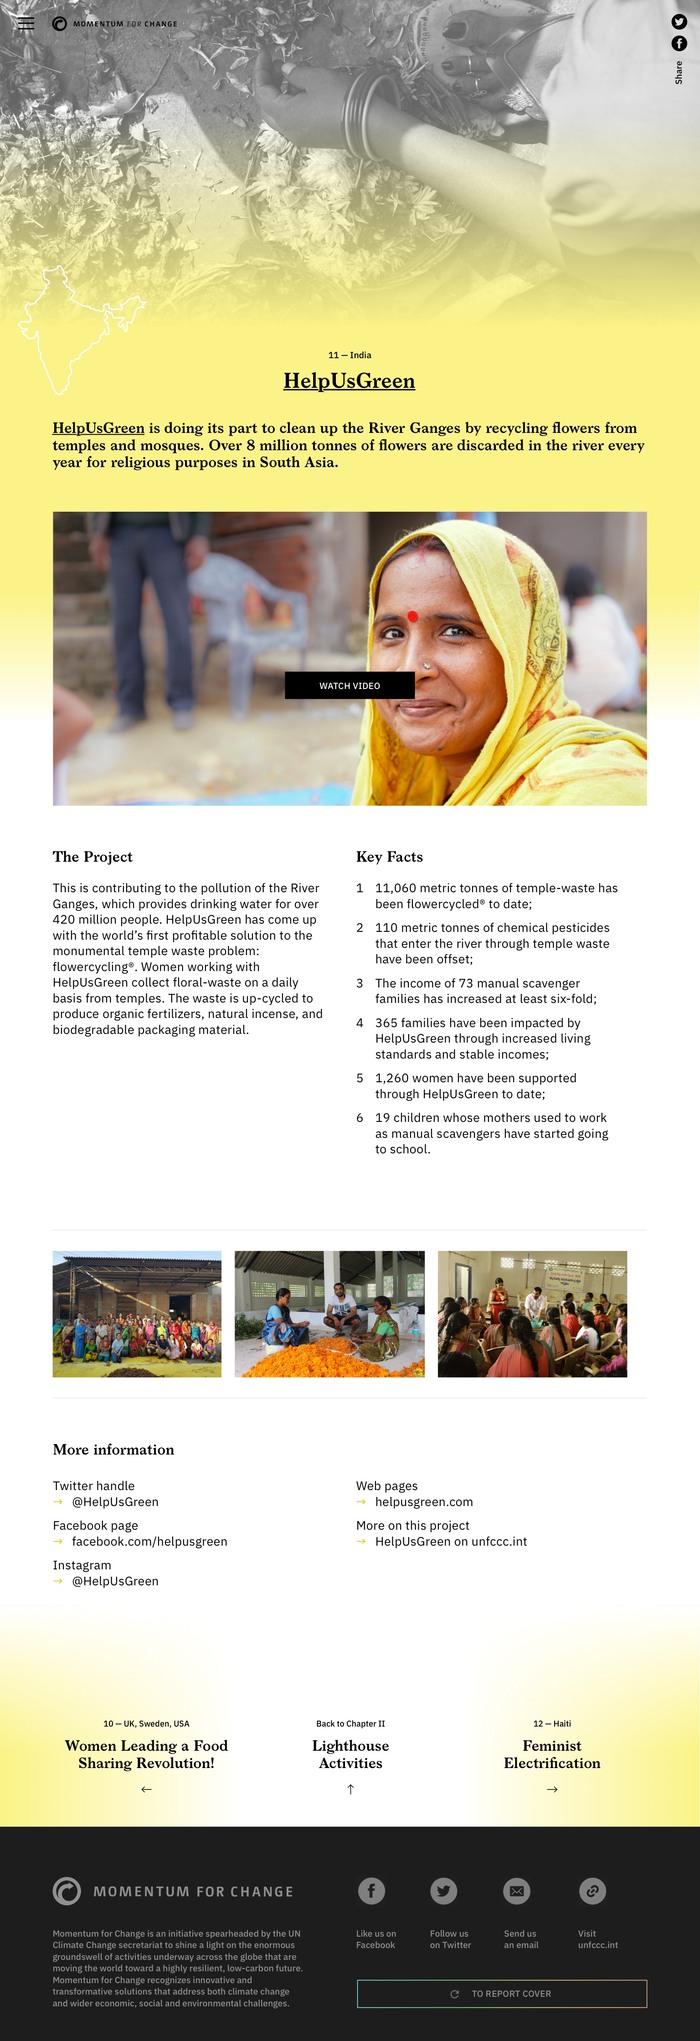 Momentum for Change 2018 Report 5